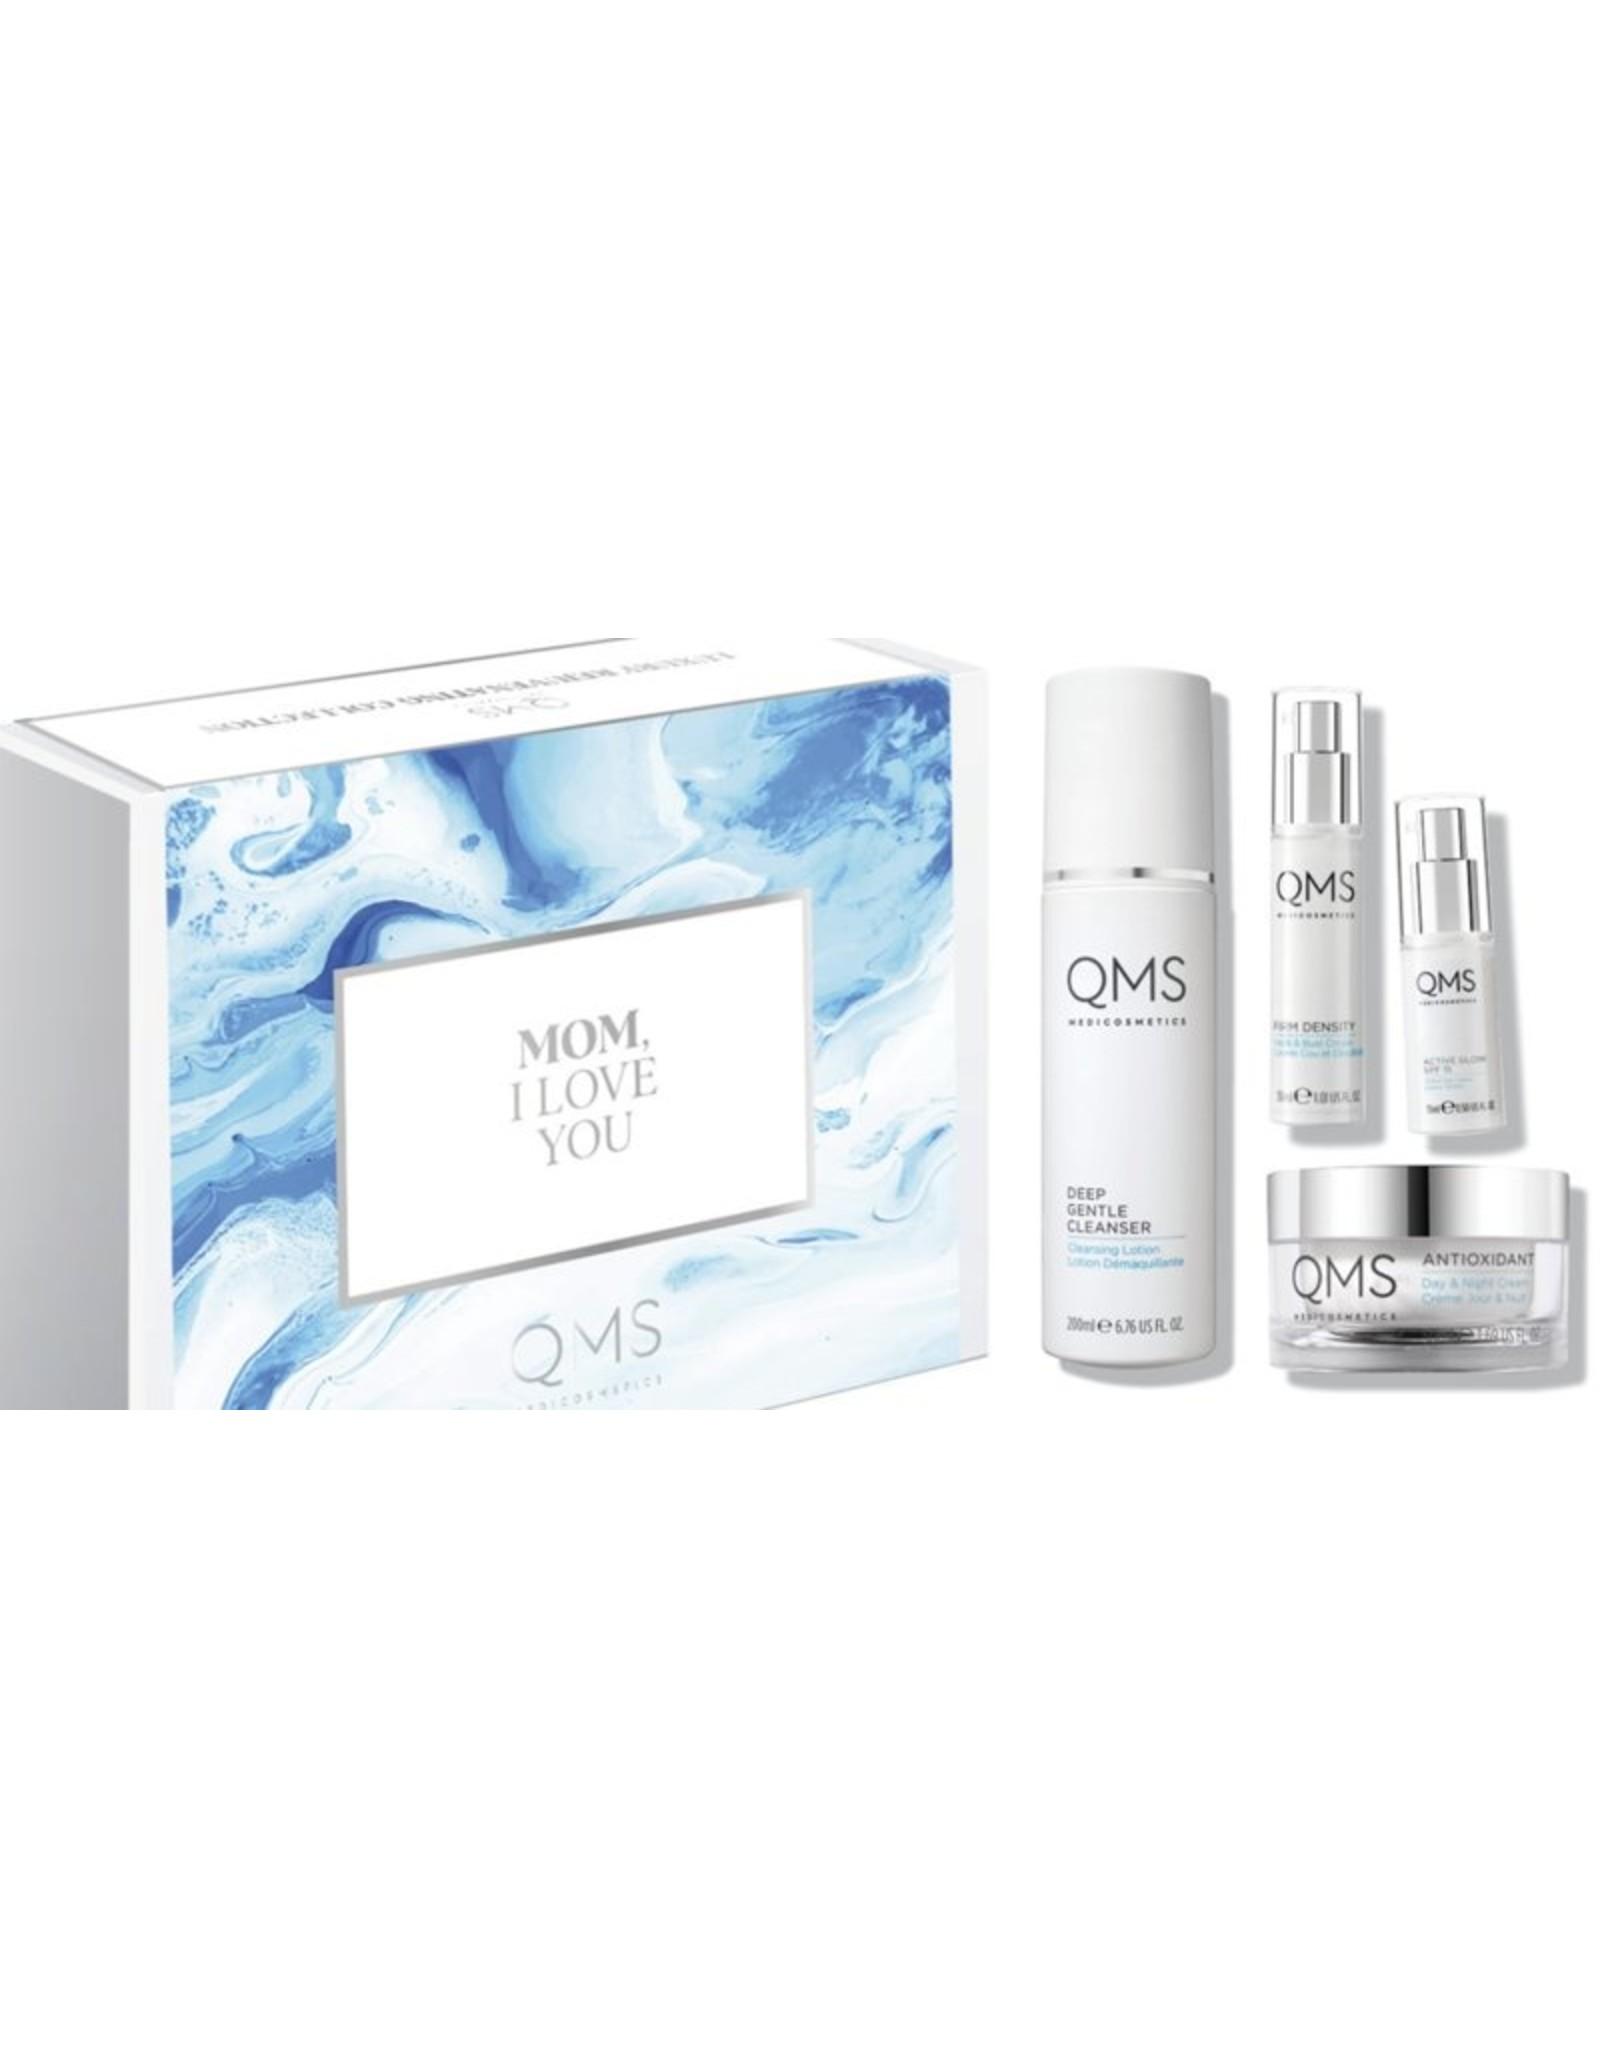 QMS Medicosmetics Luxury Rejuvenating Collection Moederdag